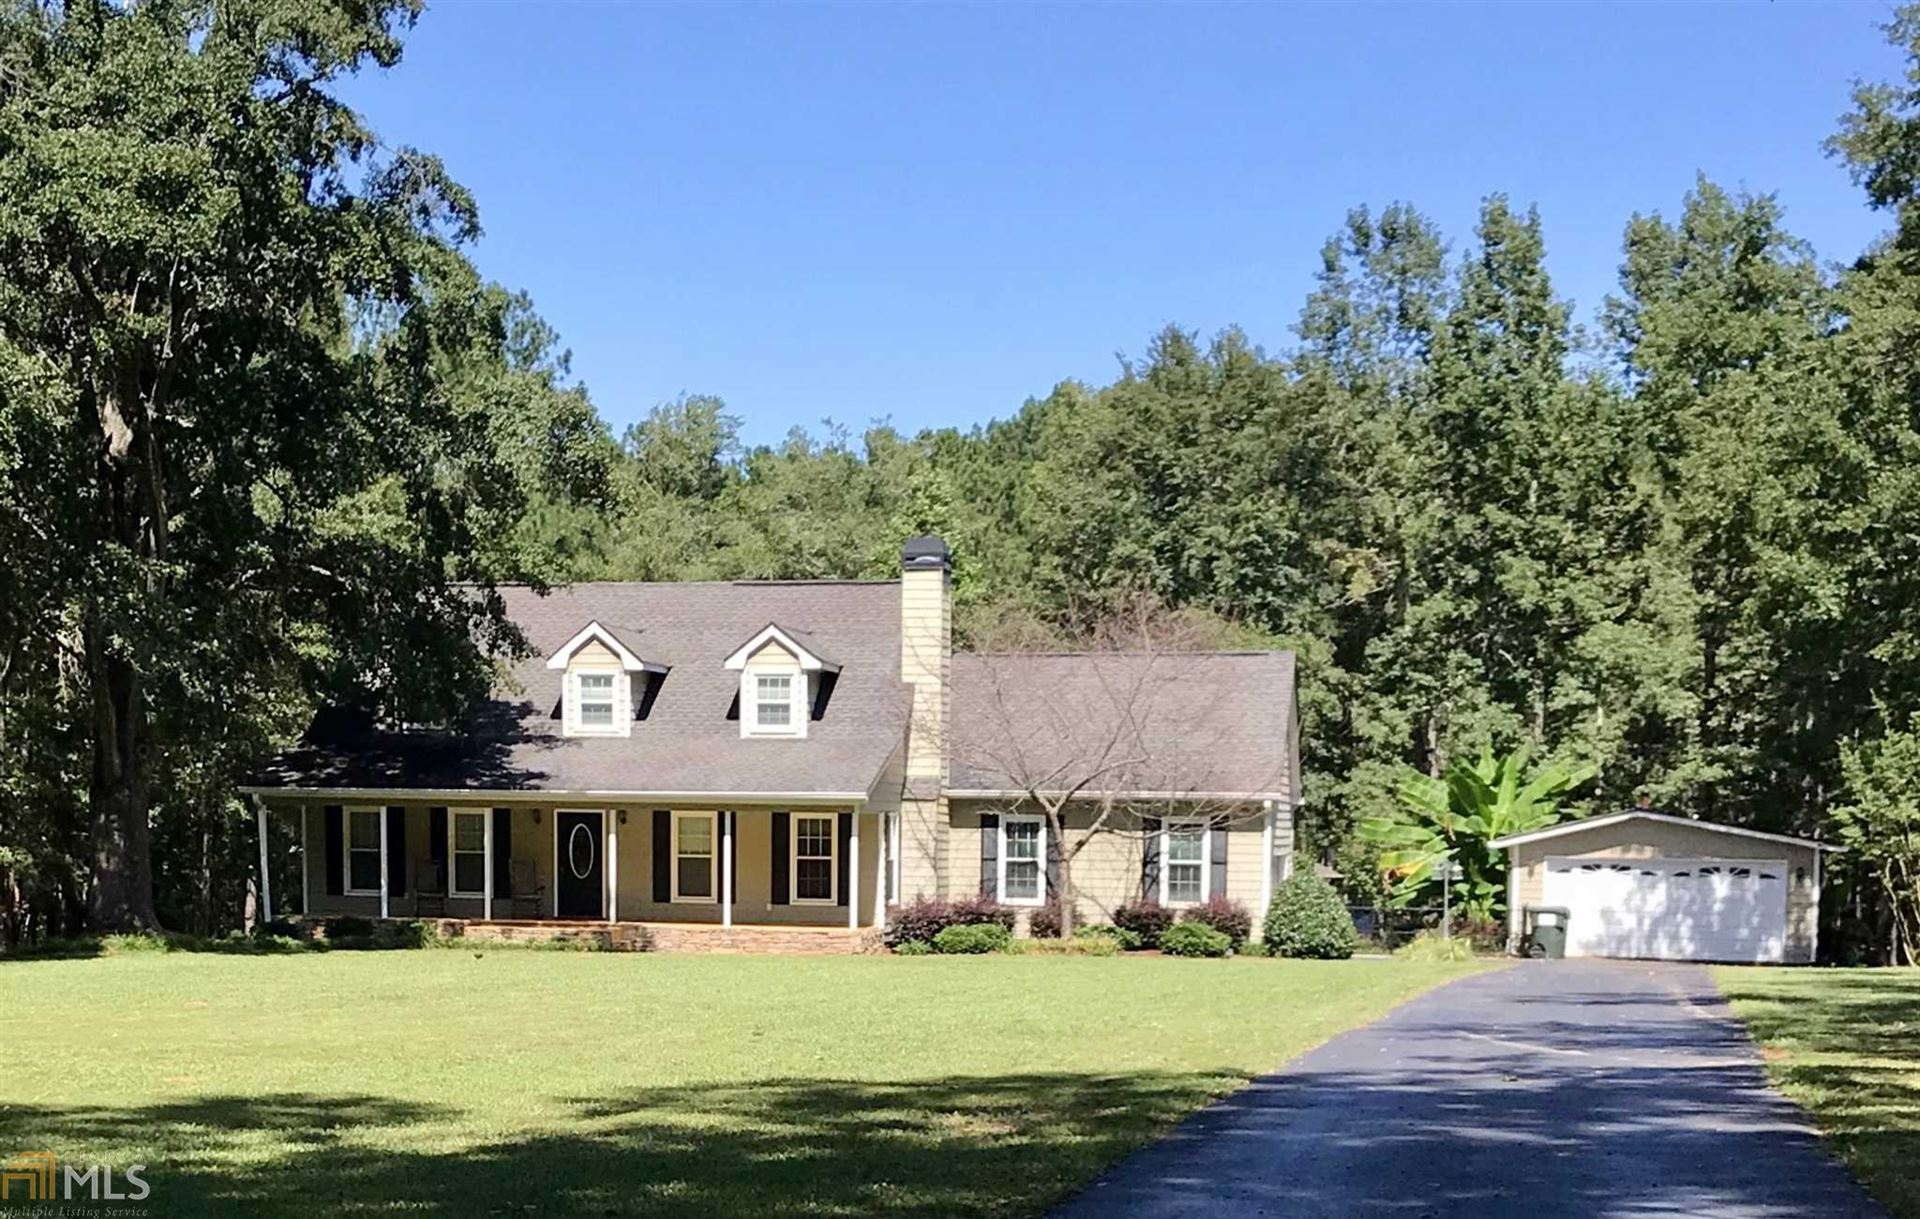 1525 Hampton Locust Grove Rd, Locust Grove, GA 30248 - #: 8950678